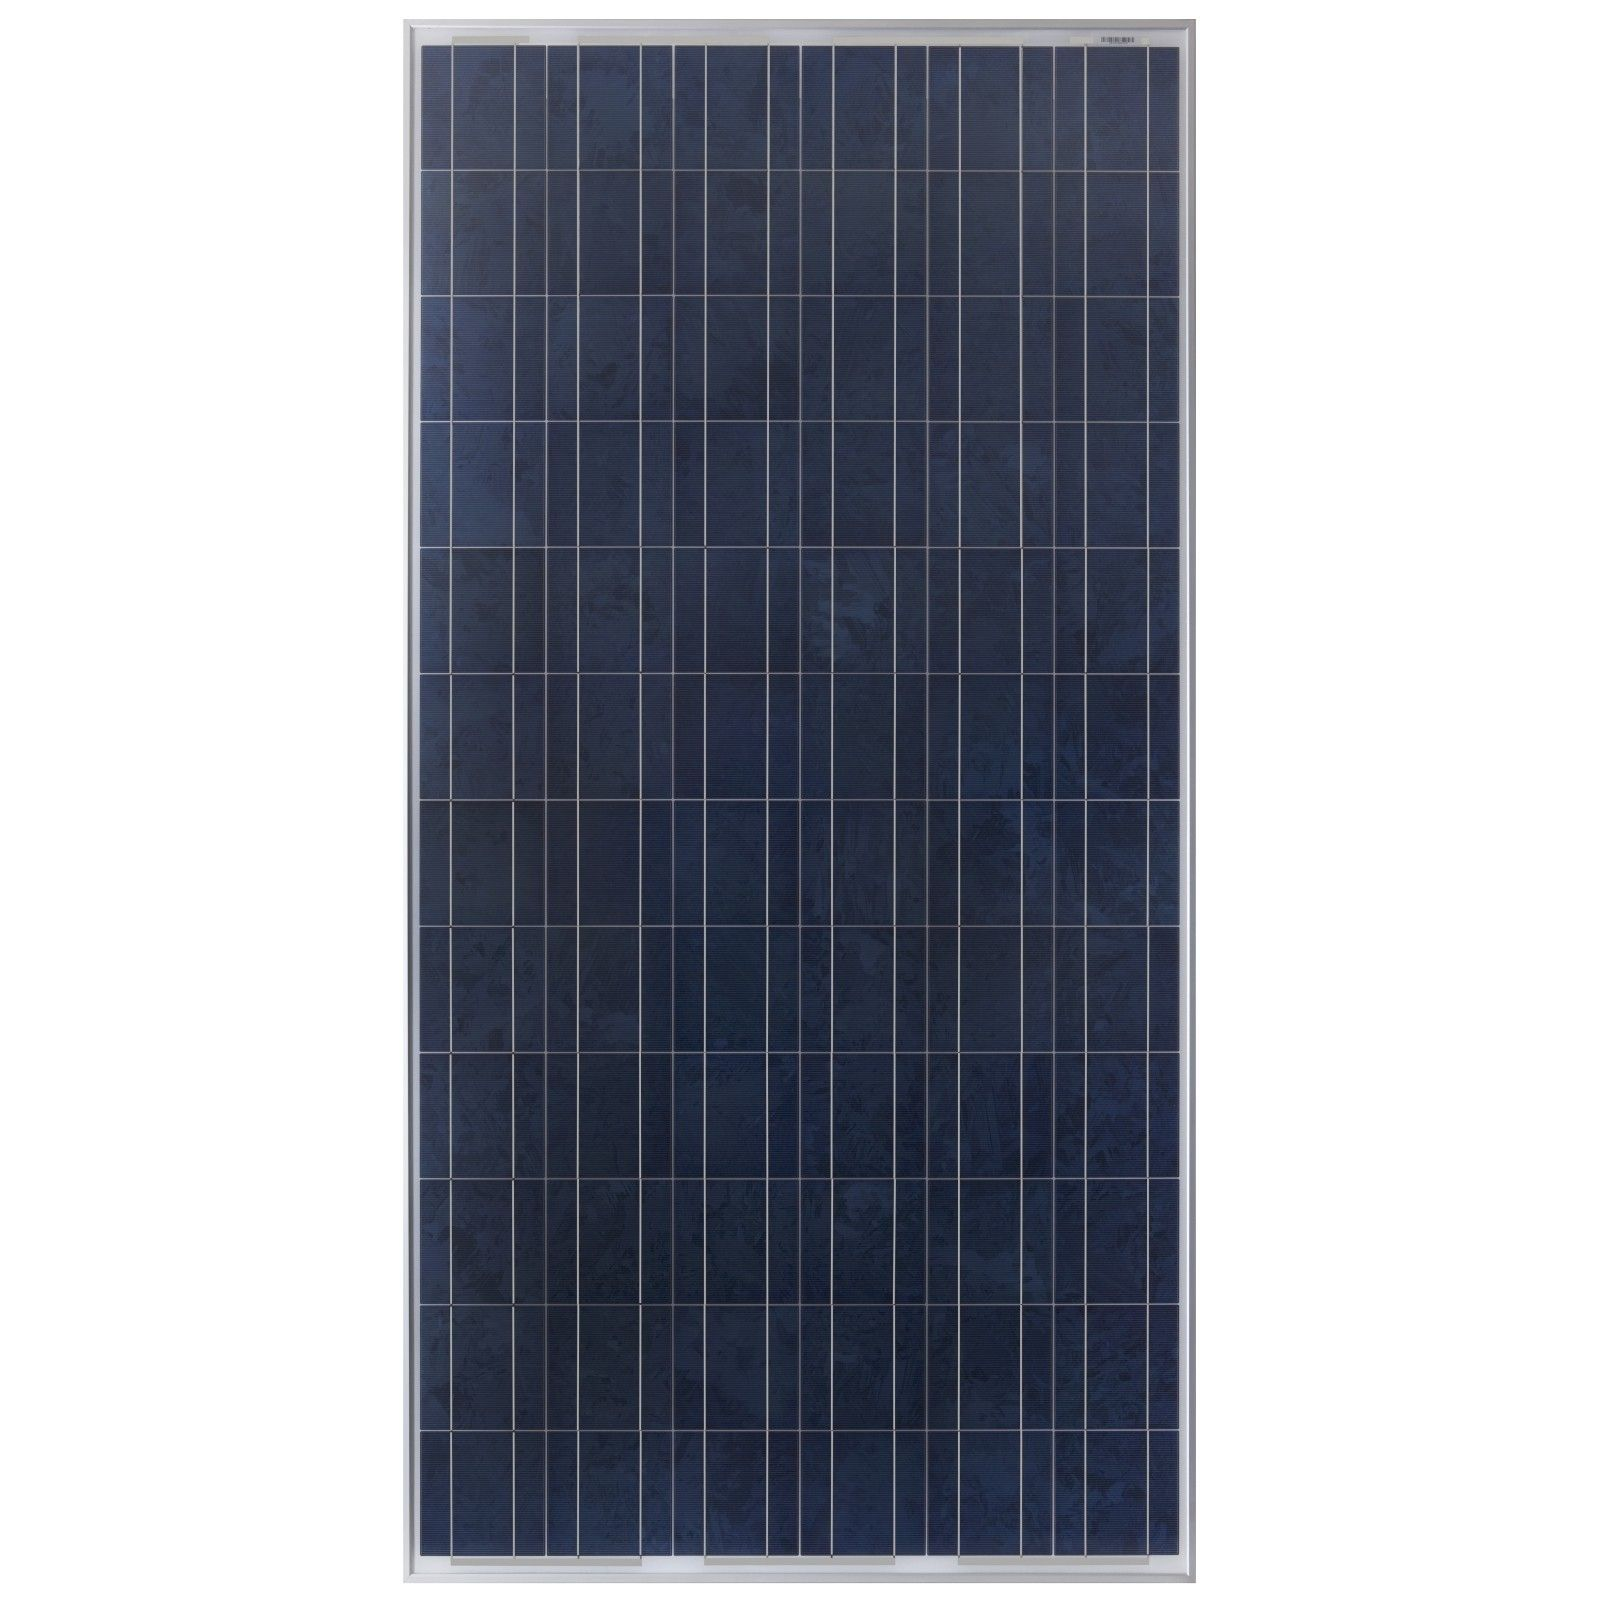 Alpex Solar 200 Watt Solar Panel Solar Panels Paneling Solar